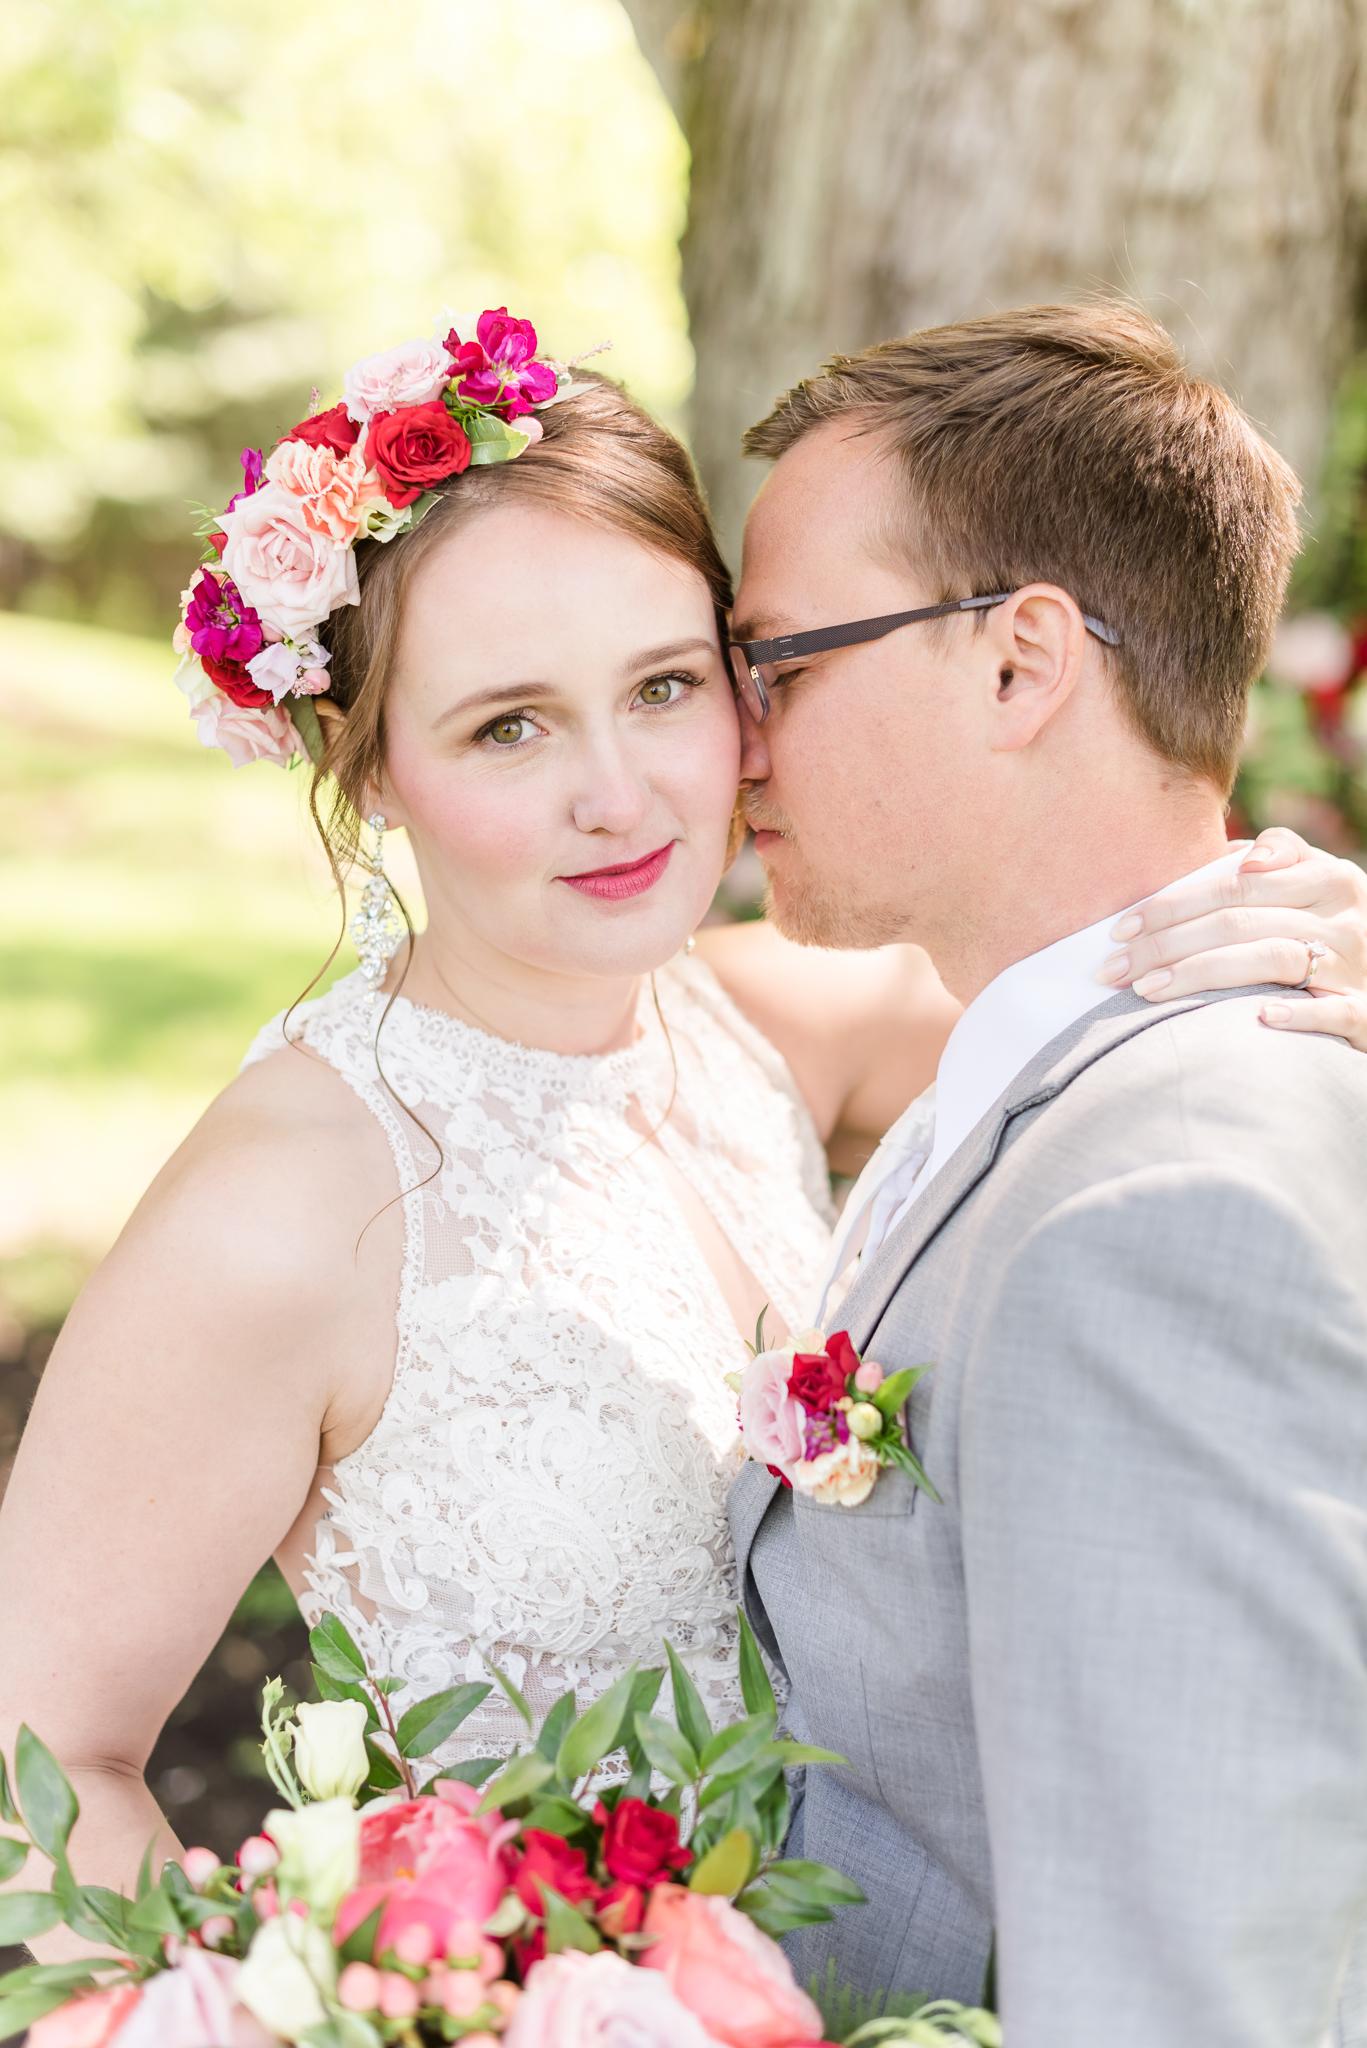 Mustard Seed Gardens Wedding Indianapolis Noblesvile Fishers Wedding Photographer-50.jpg